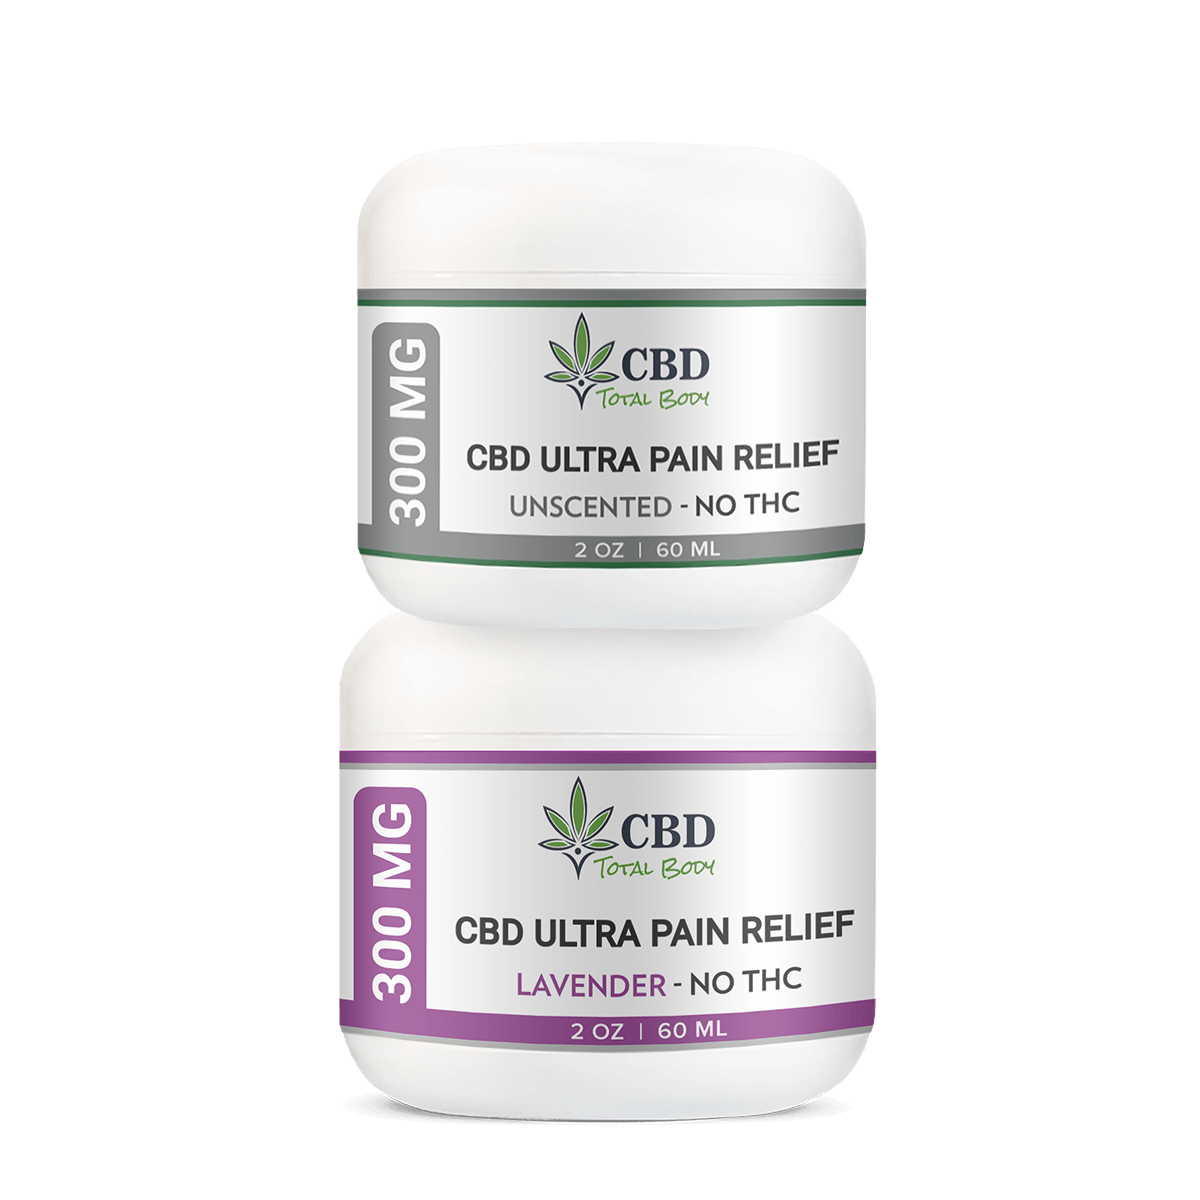 CBD Ultra Pain Relief Cream 2oz Jar Best CBD Cream for Arthritis